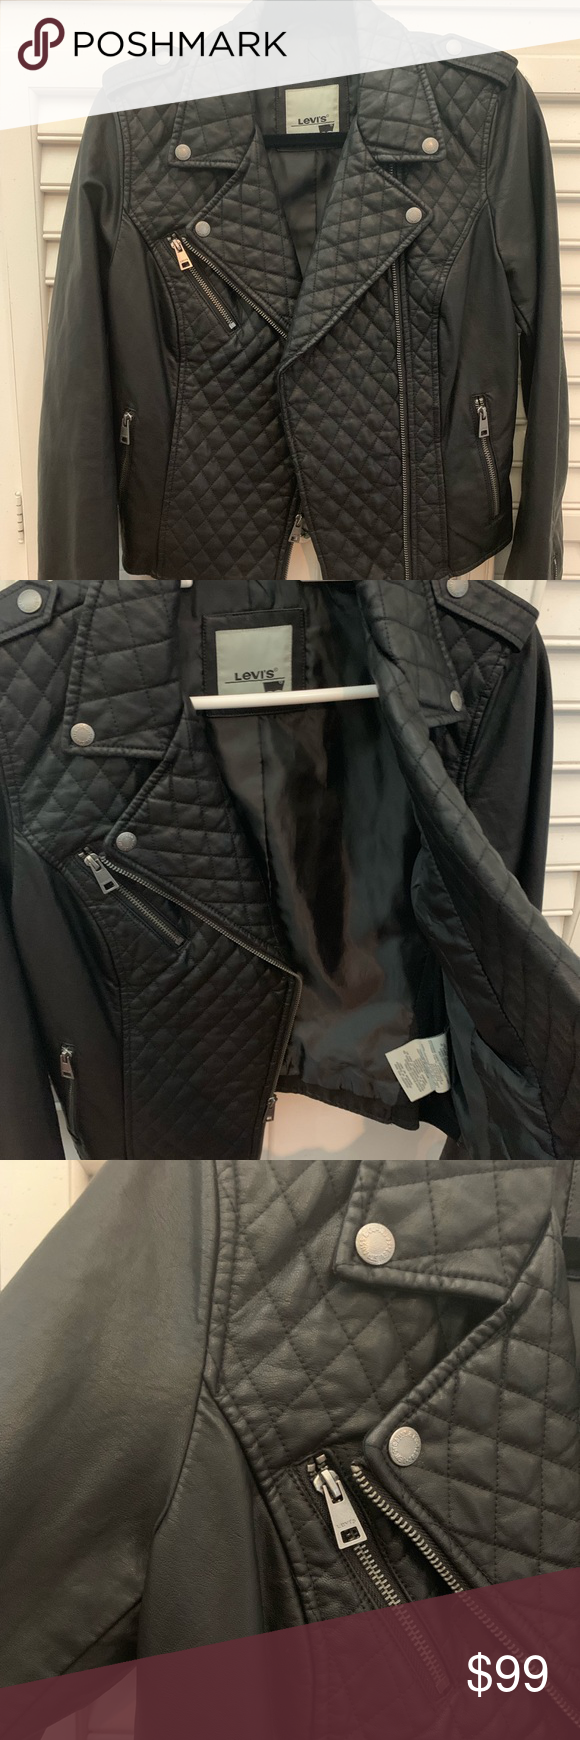 Levi's Faux Leather Jacket Black faux leather jacket